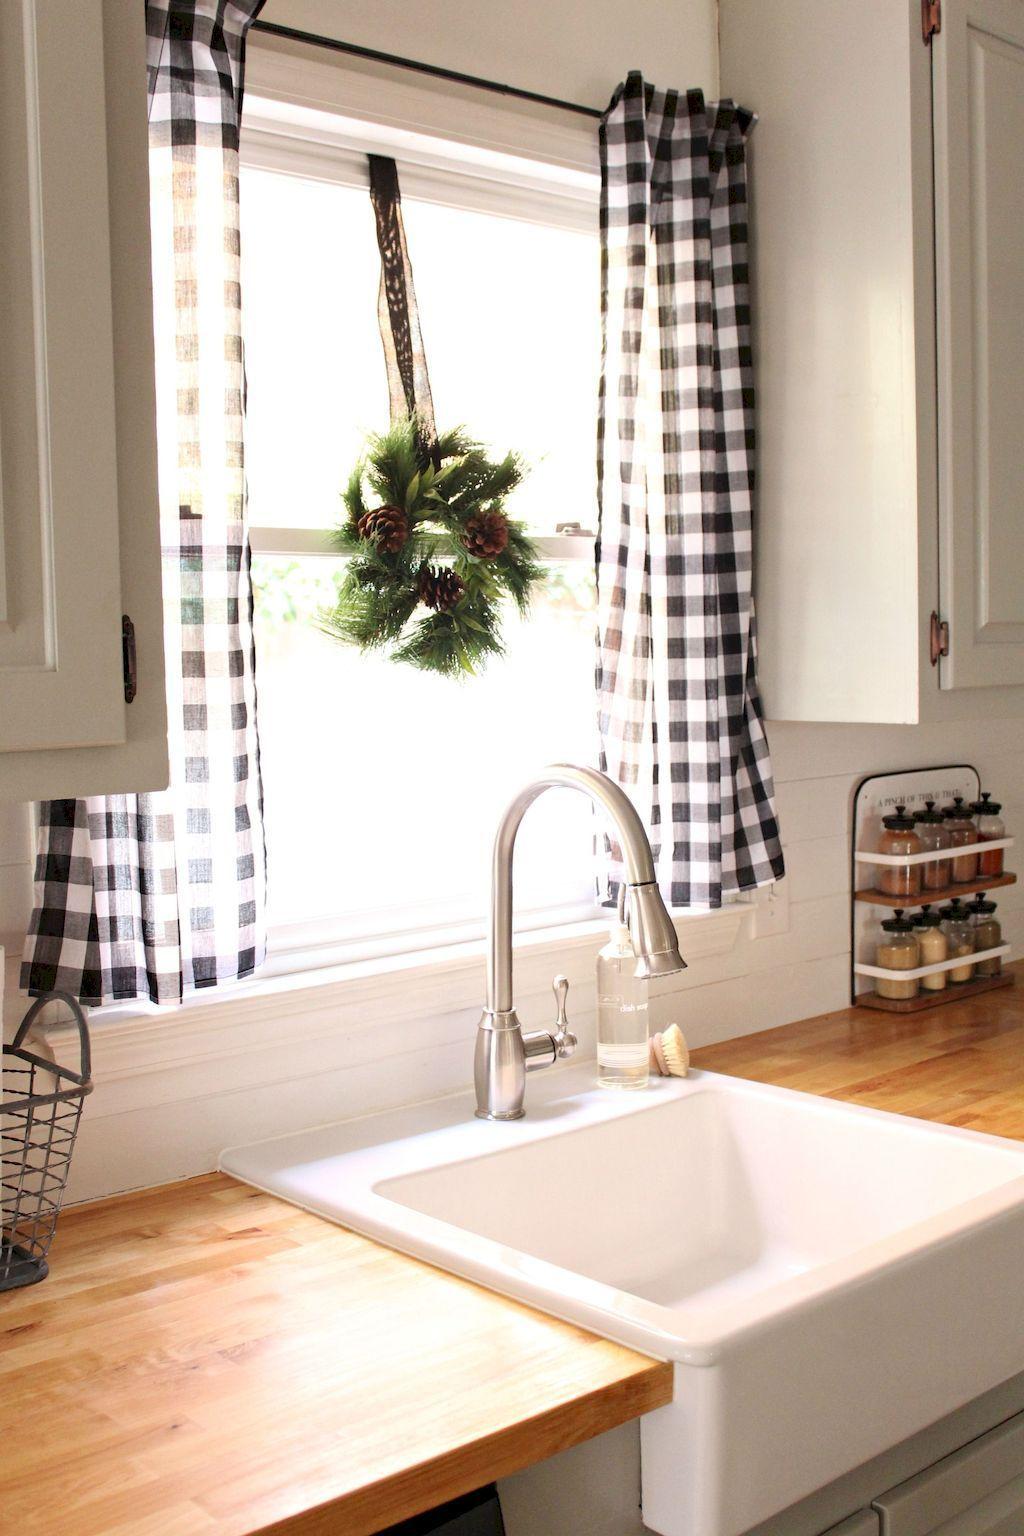 cortina xadrez em cozinha